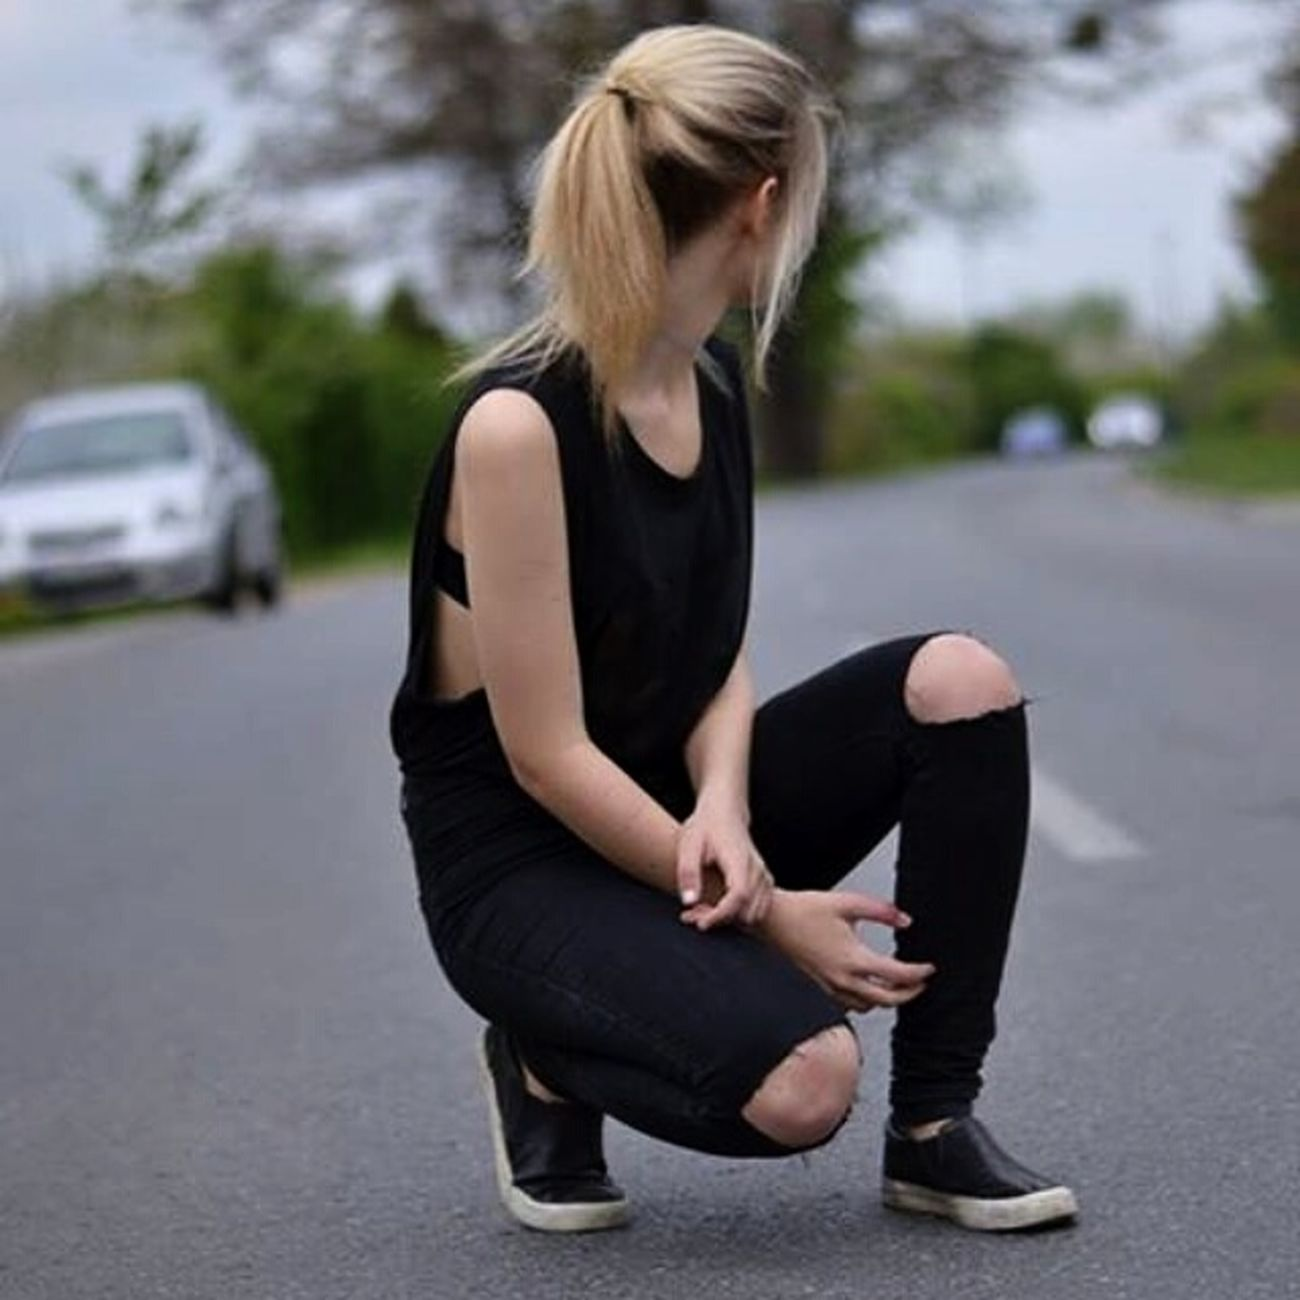 Polishgirl Black Blackfashion Slipon Blonde Girl Blonde